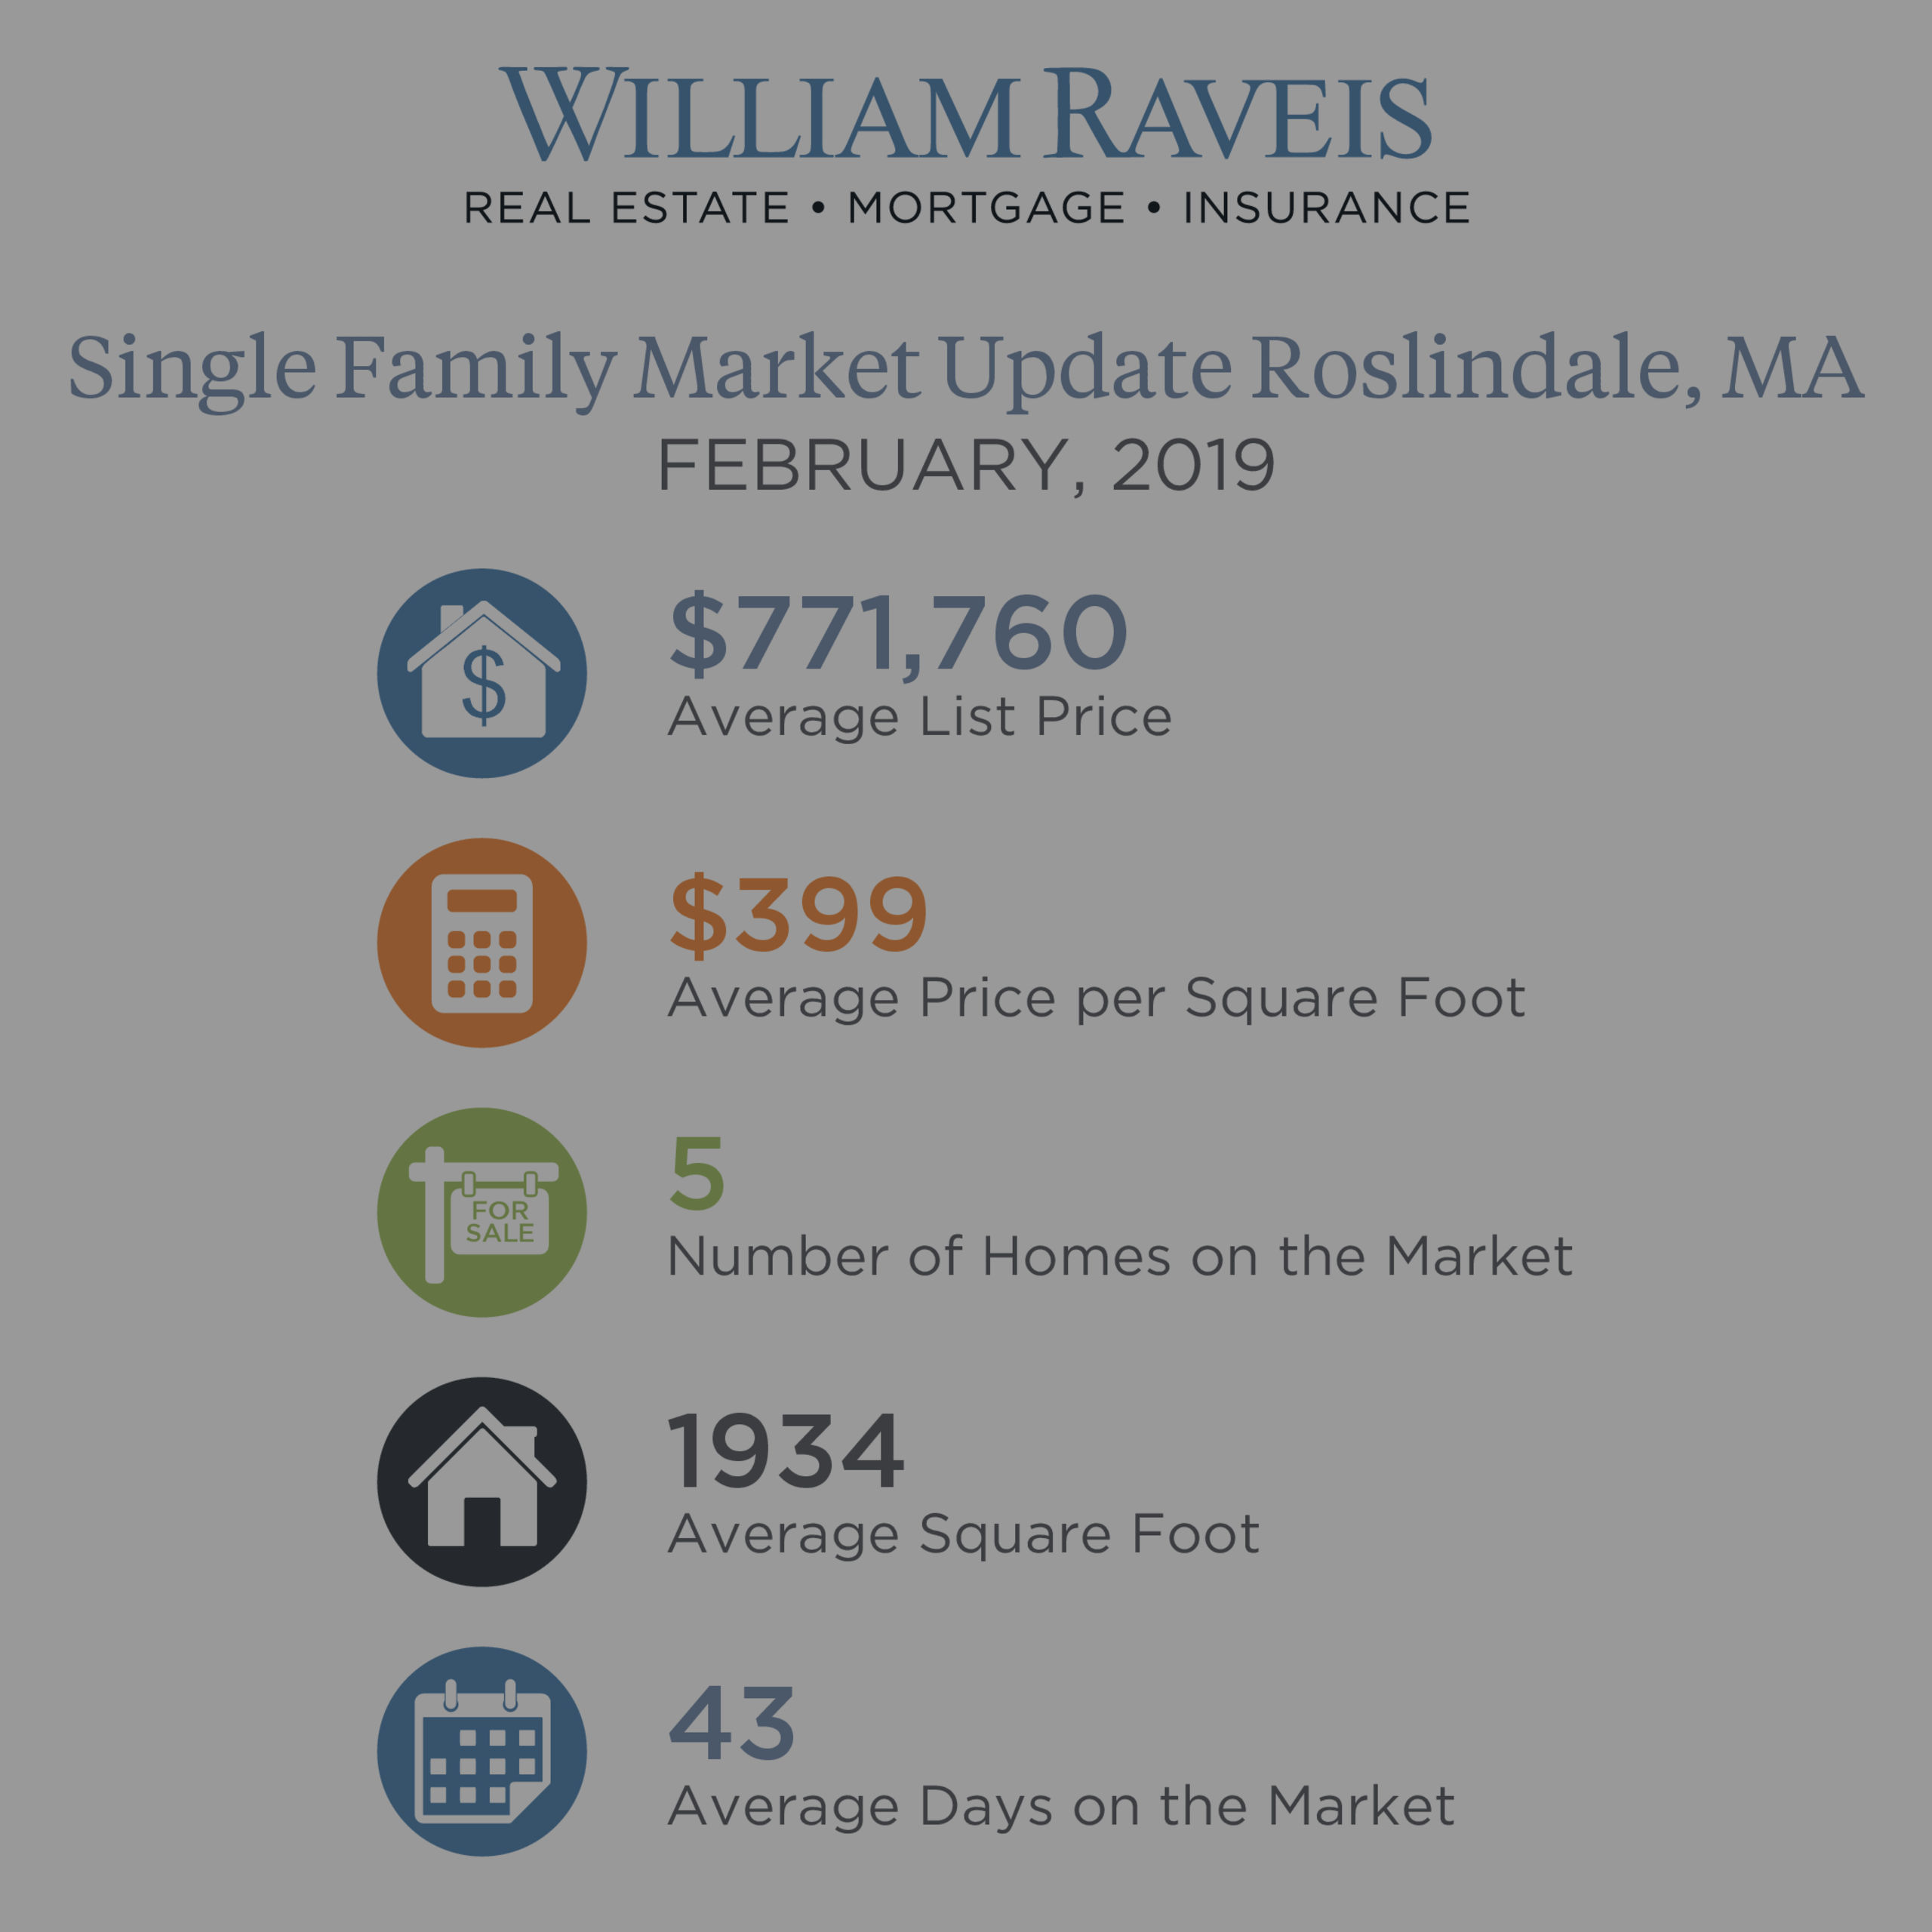 Roslindale Single Family & Condominium Housing Market Update February 2019